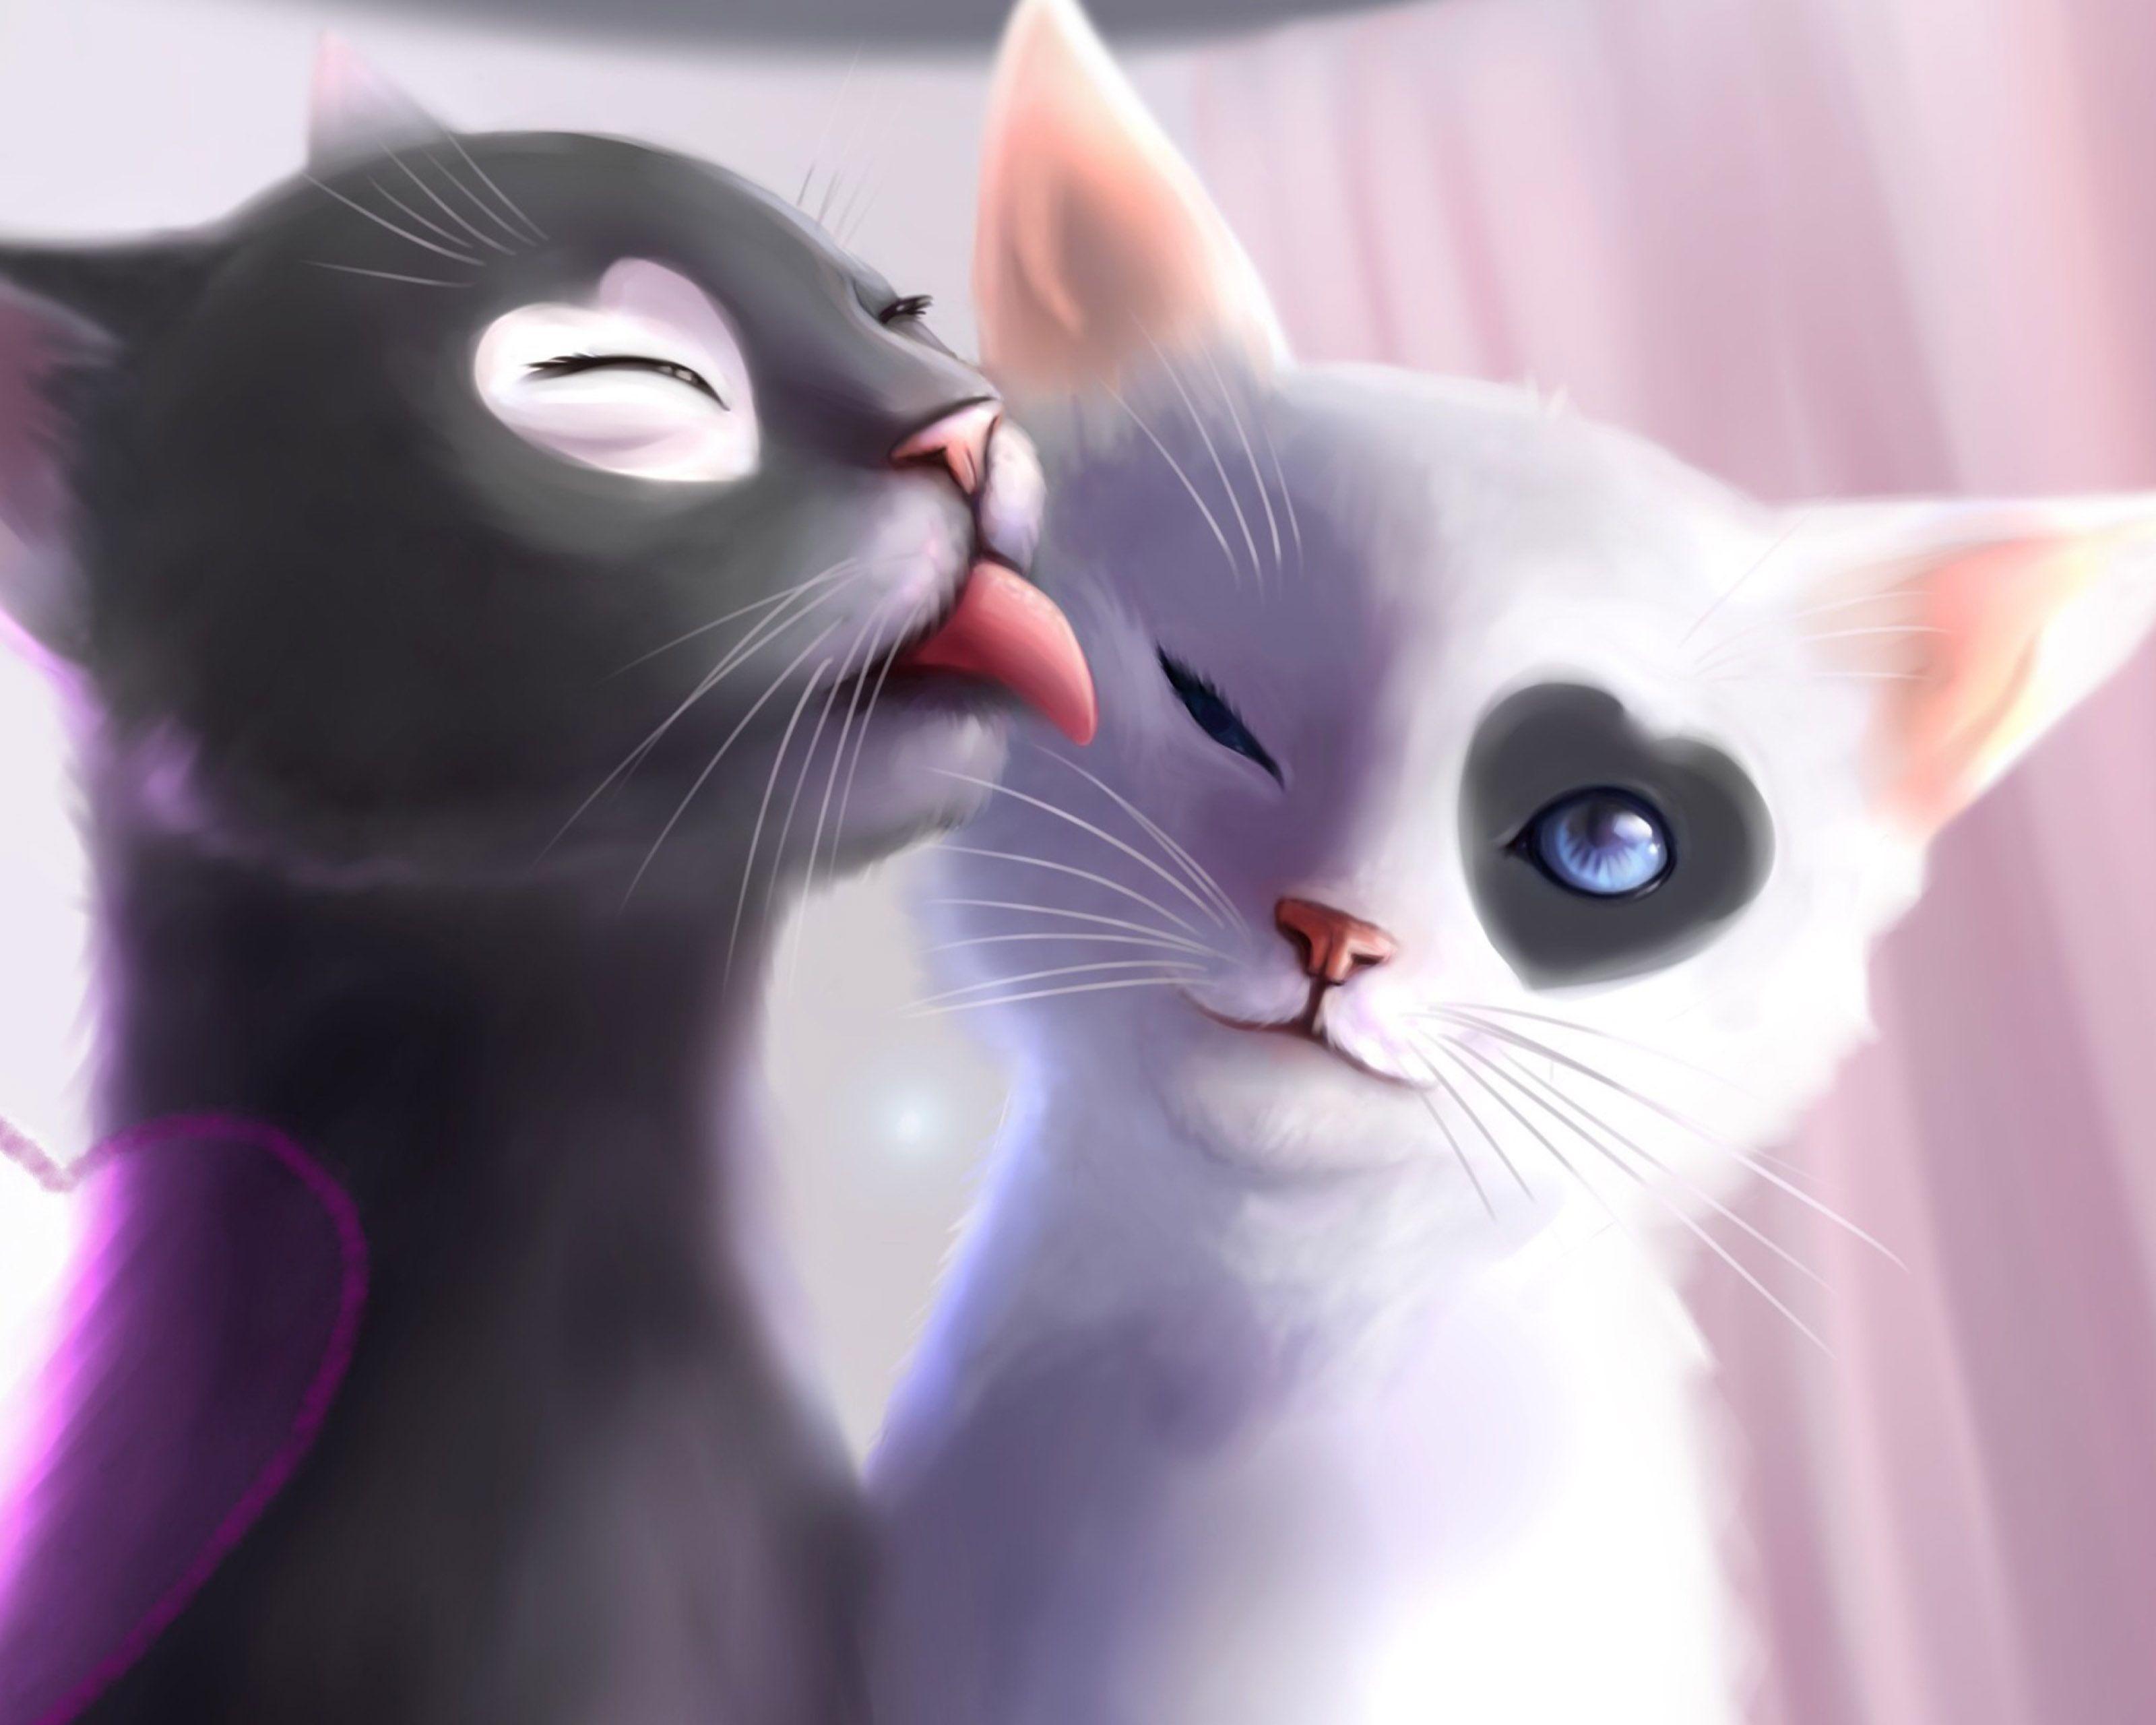 Romantic Ipad Wallpaper: Black And White Cats Romance